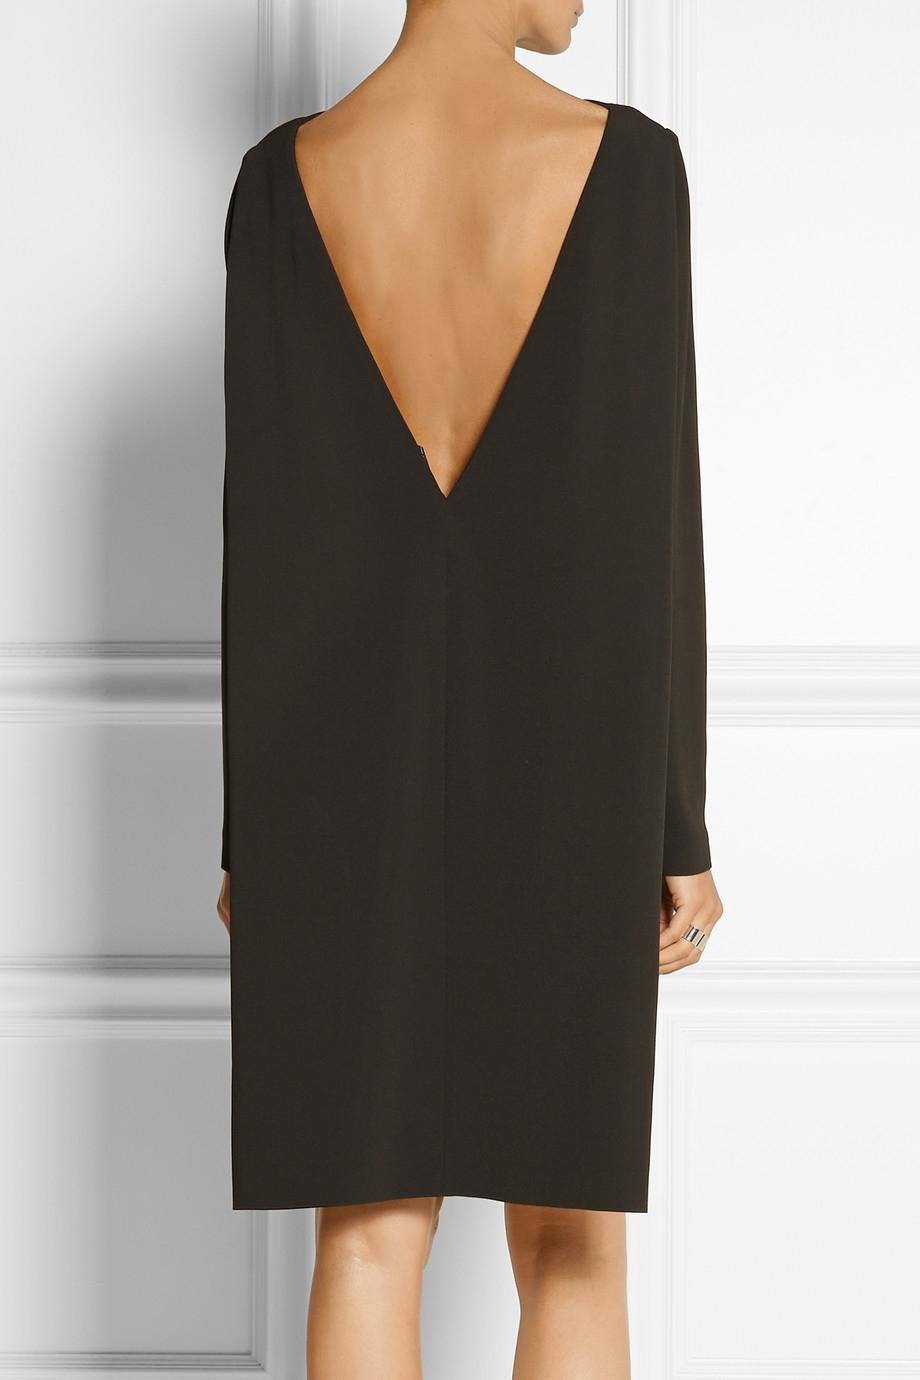 4ef2eaf31f4 Lyst - Calvin Klein Amsai Stretchcrepe Dress in Brown